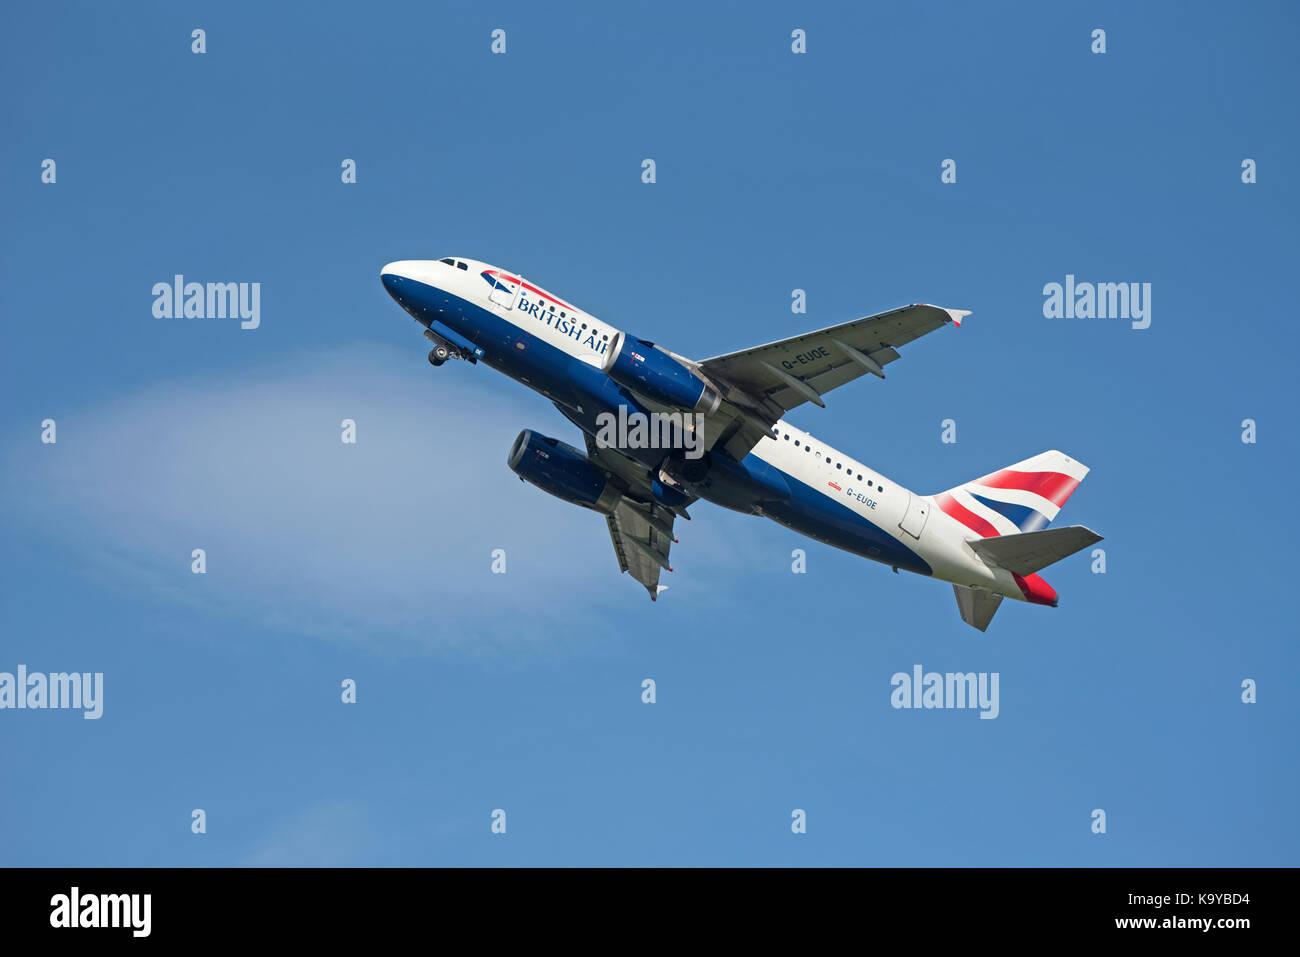 British Airways 319-131 flight departing Inverness for London Heathrow on its daily scheduled flight Stock Photo